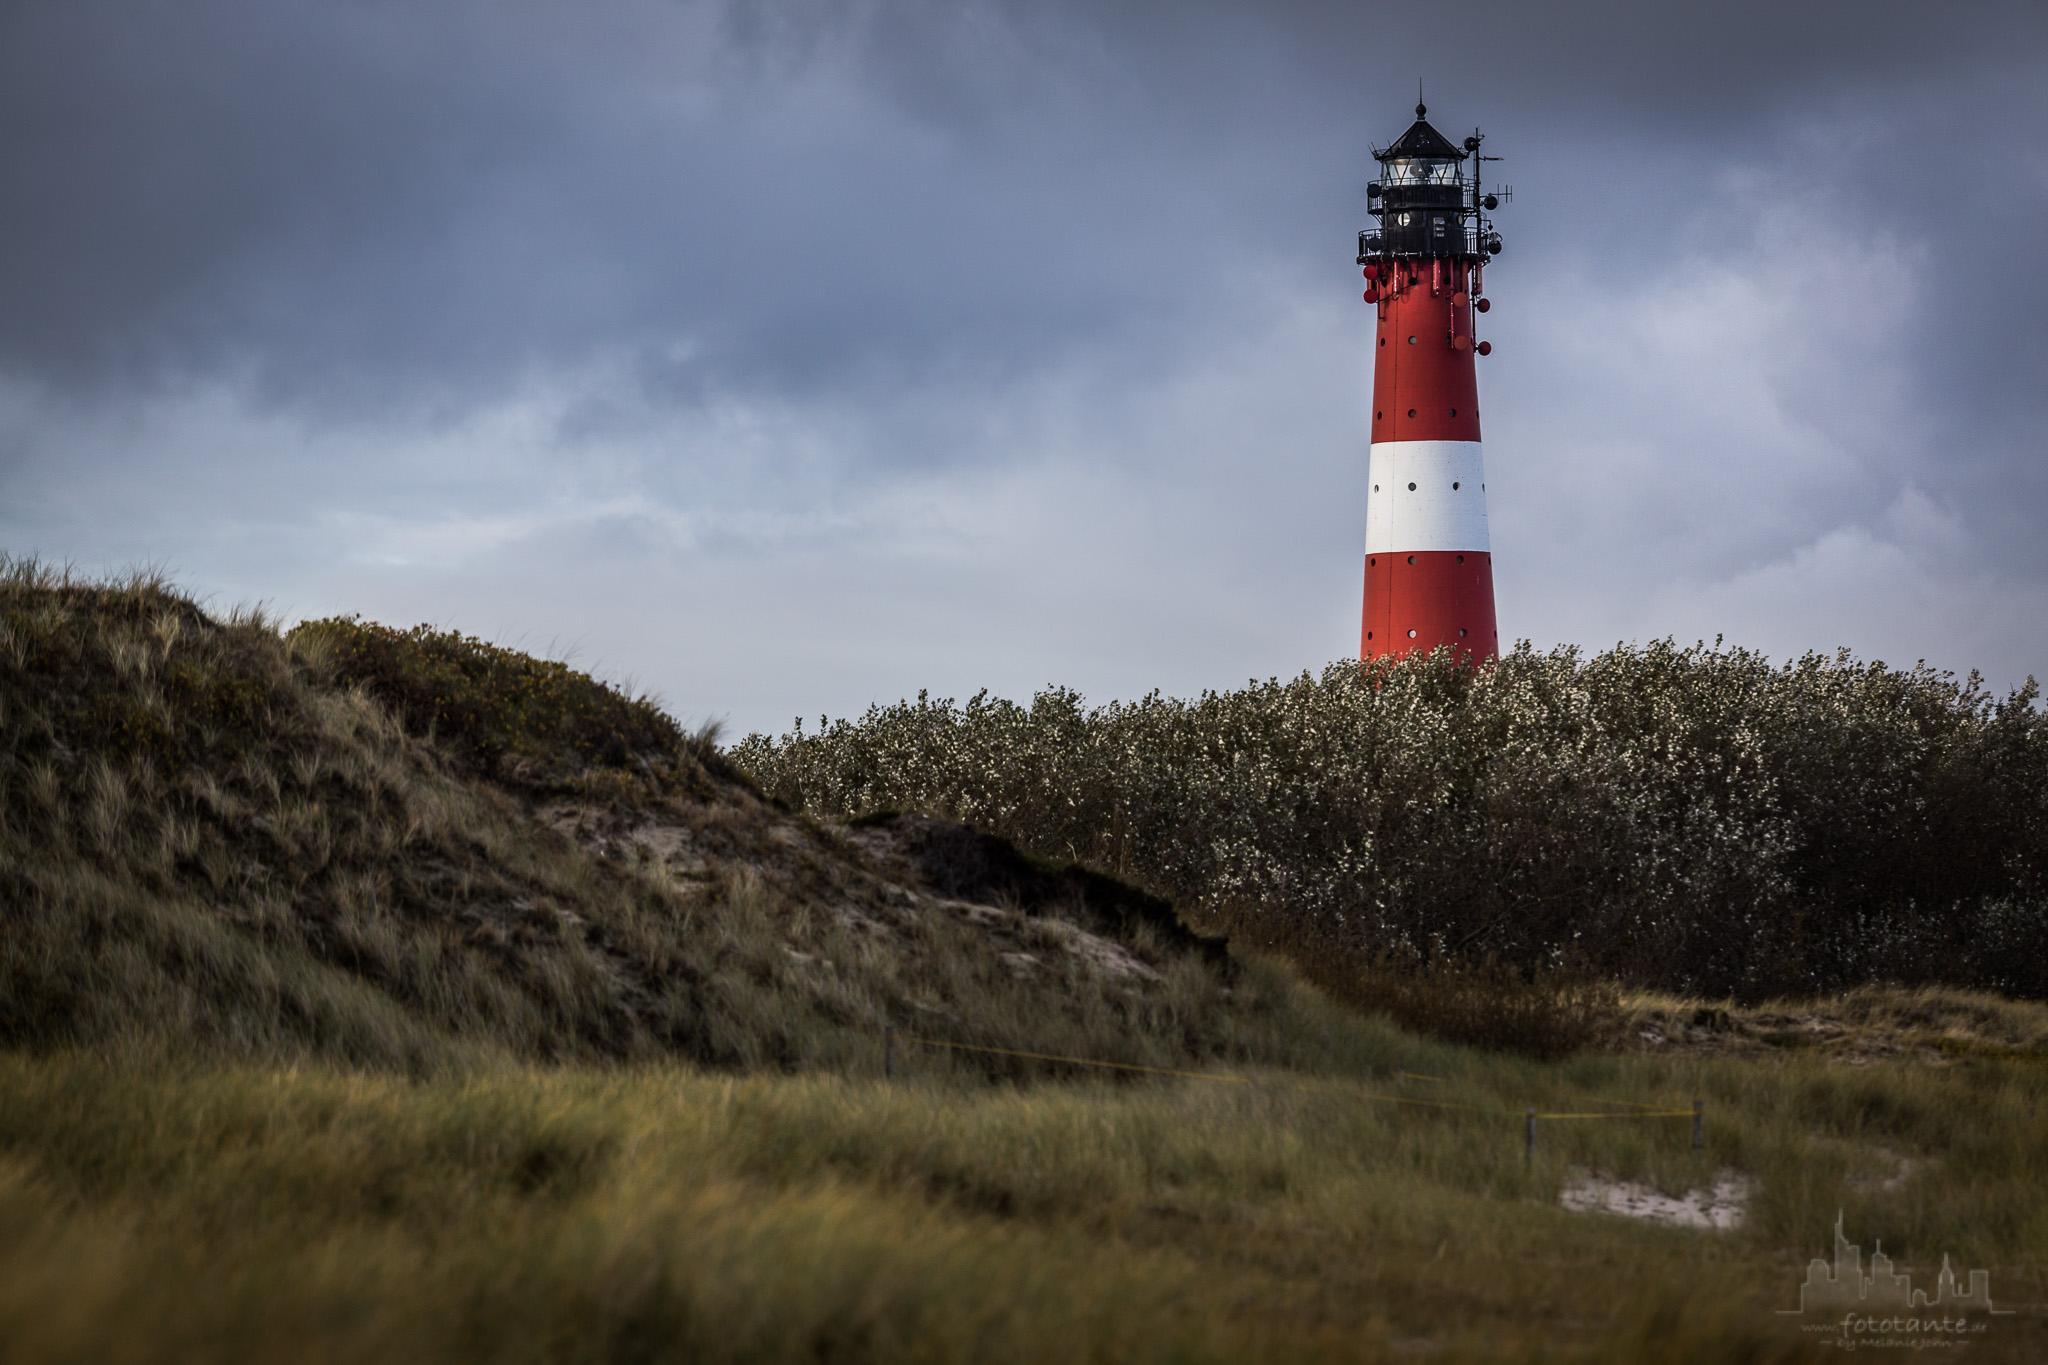 Lighthouse in Hörnum, Sylt, Germany